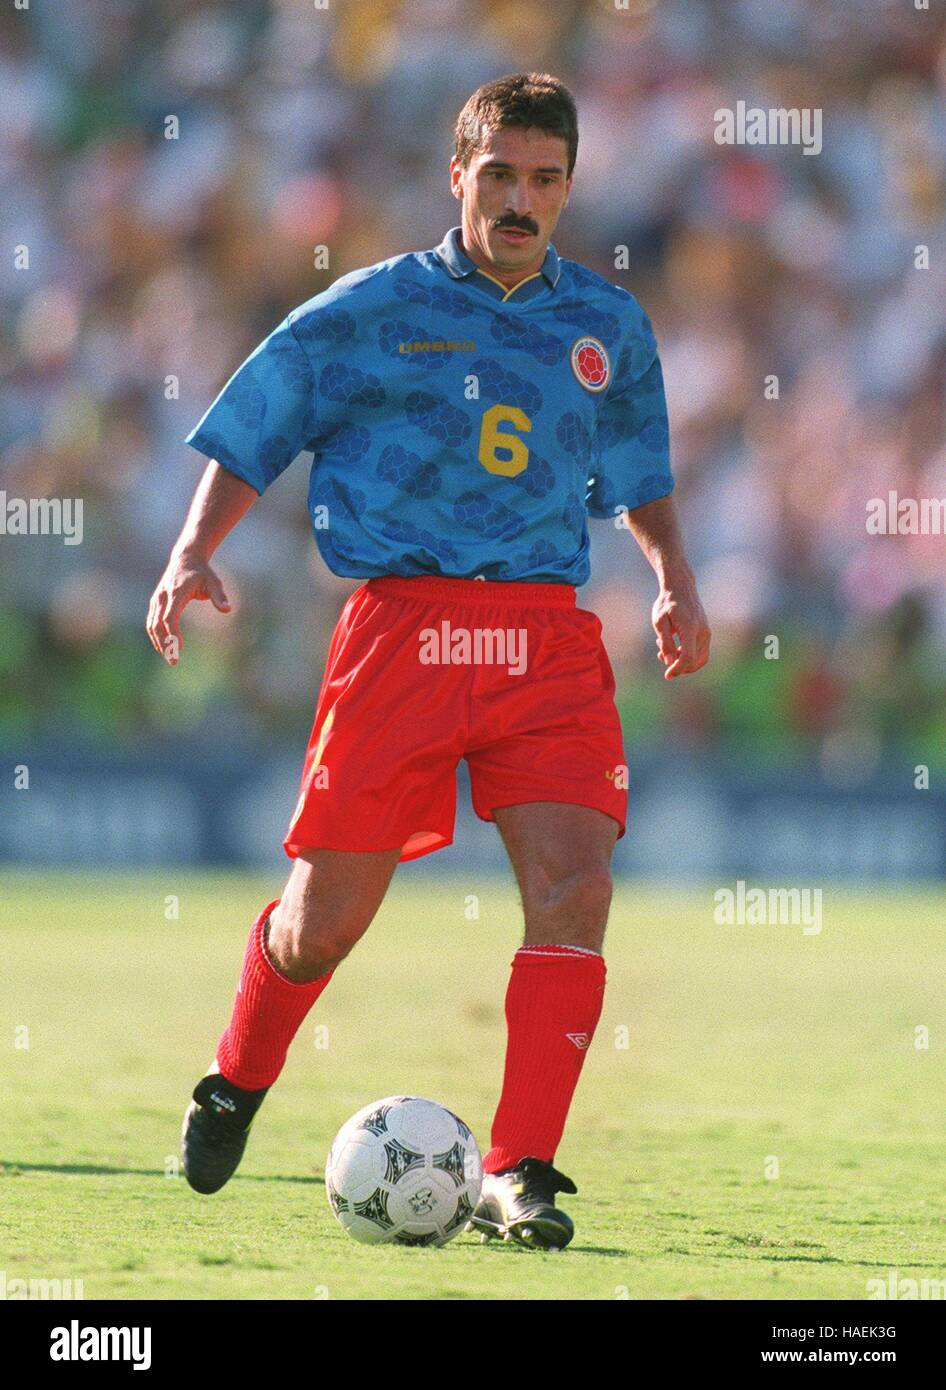 Download Gabriel Gomez - gabriel-gomez-colombia-20-june-1994-HAEK3G  Image-962019.jpg